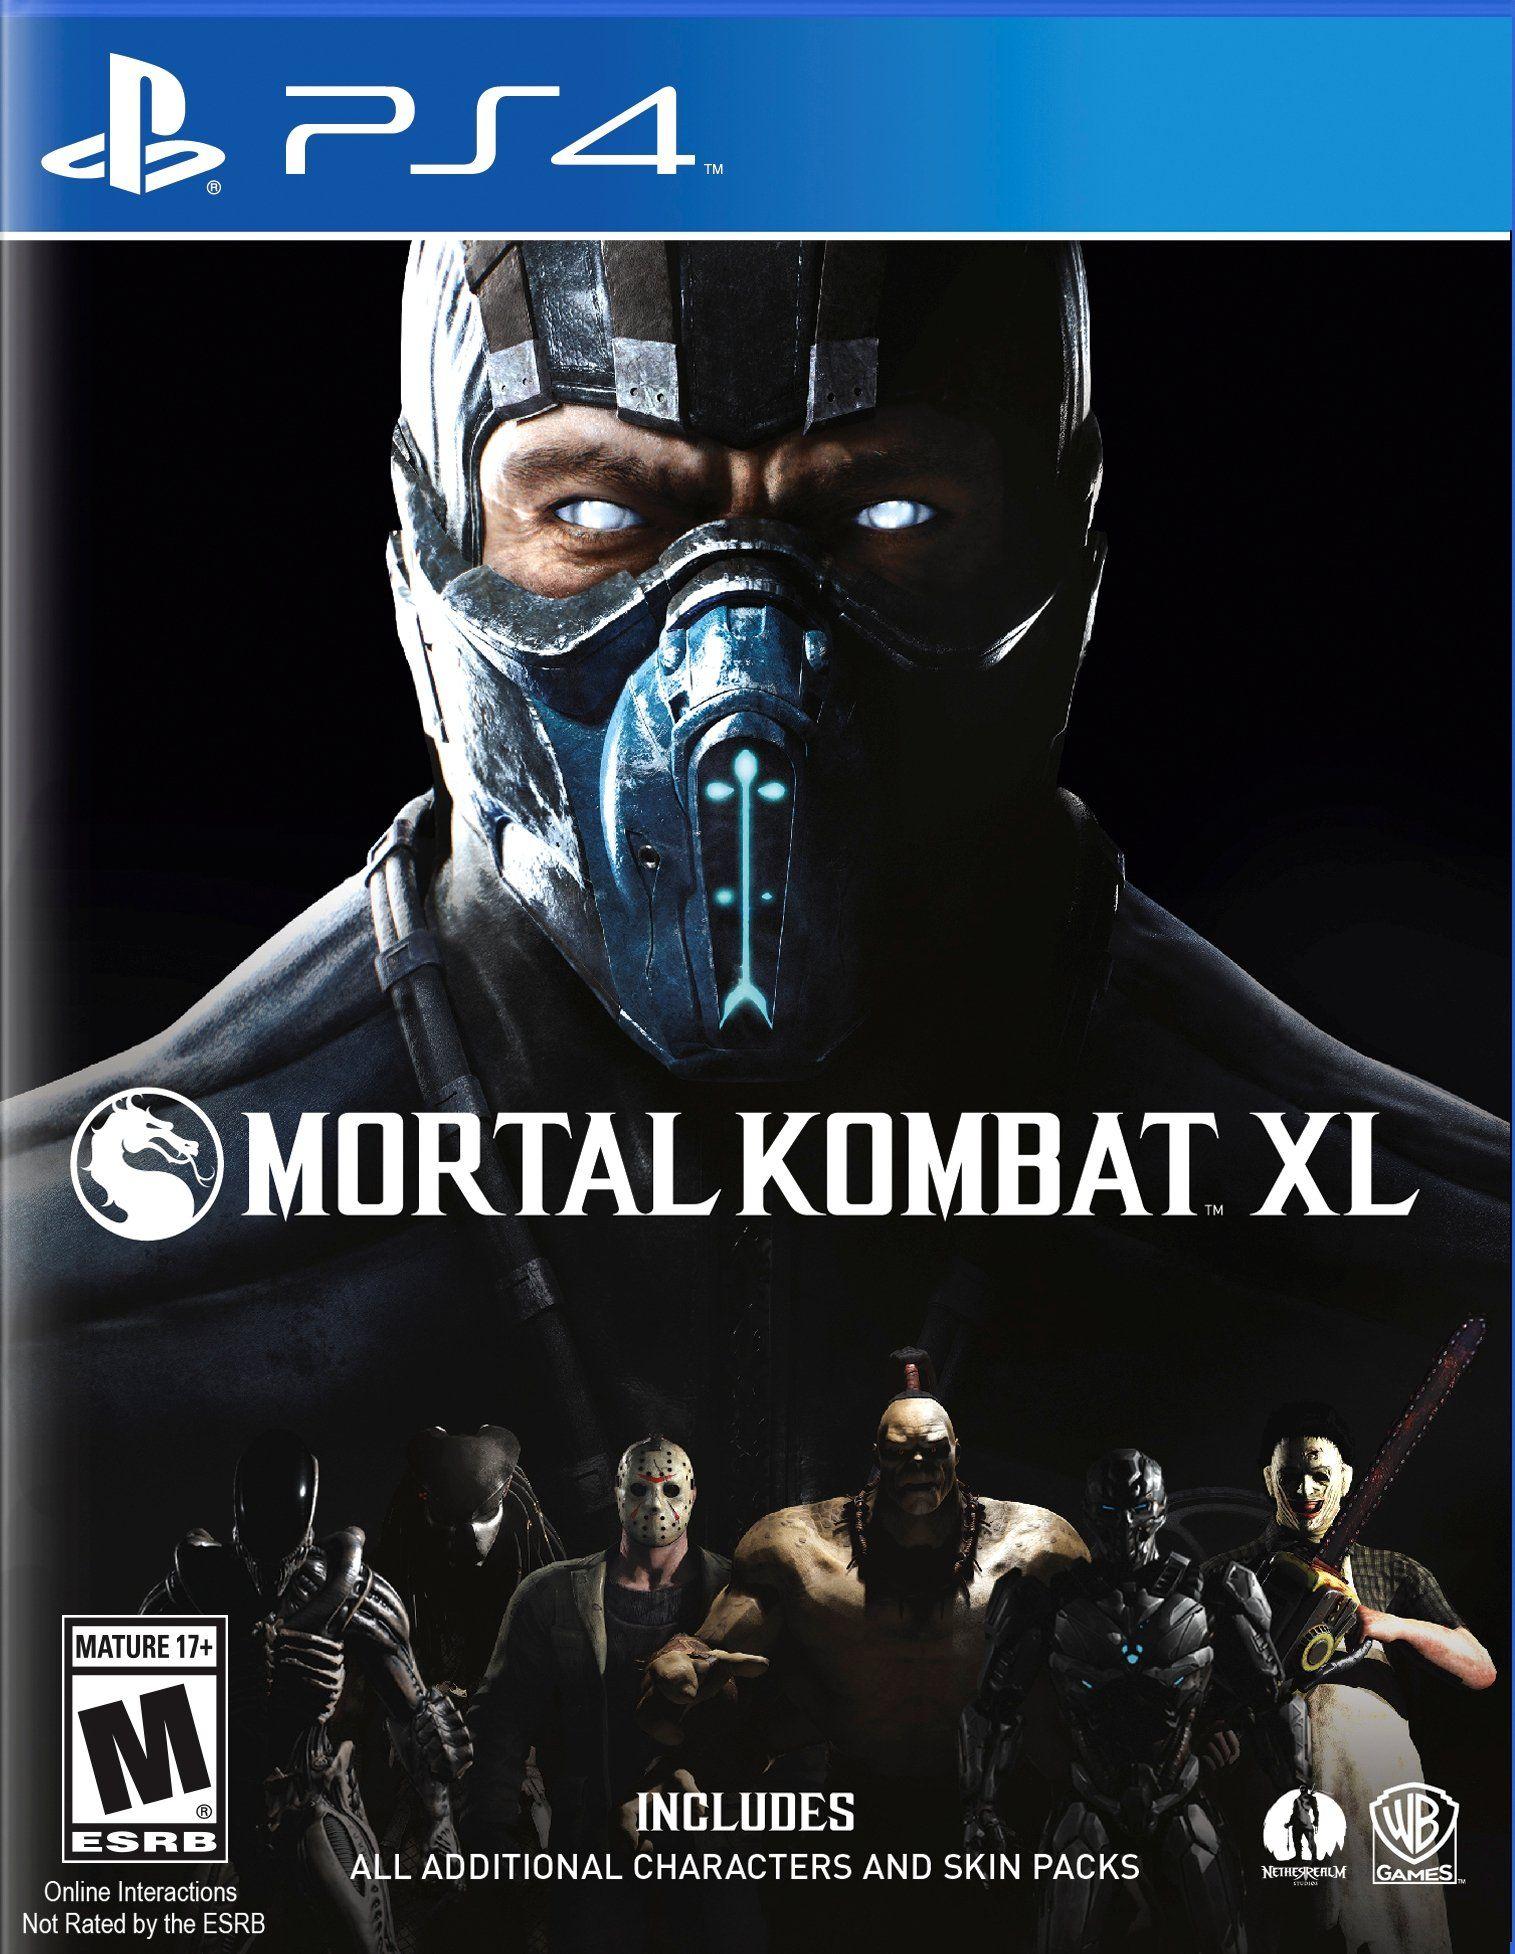 Mortal Kombat Xl Release Date Xbox One Ps4 Juegos De Ps3 Ps4 Juegos Mortal Kombat X